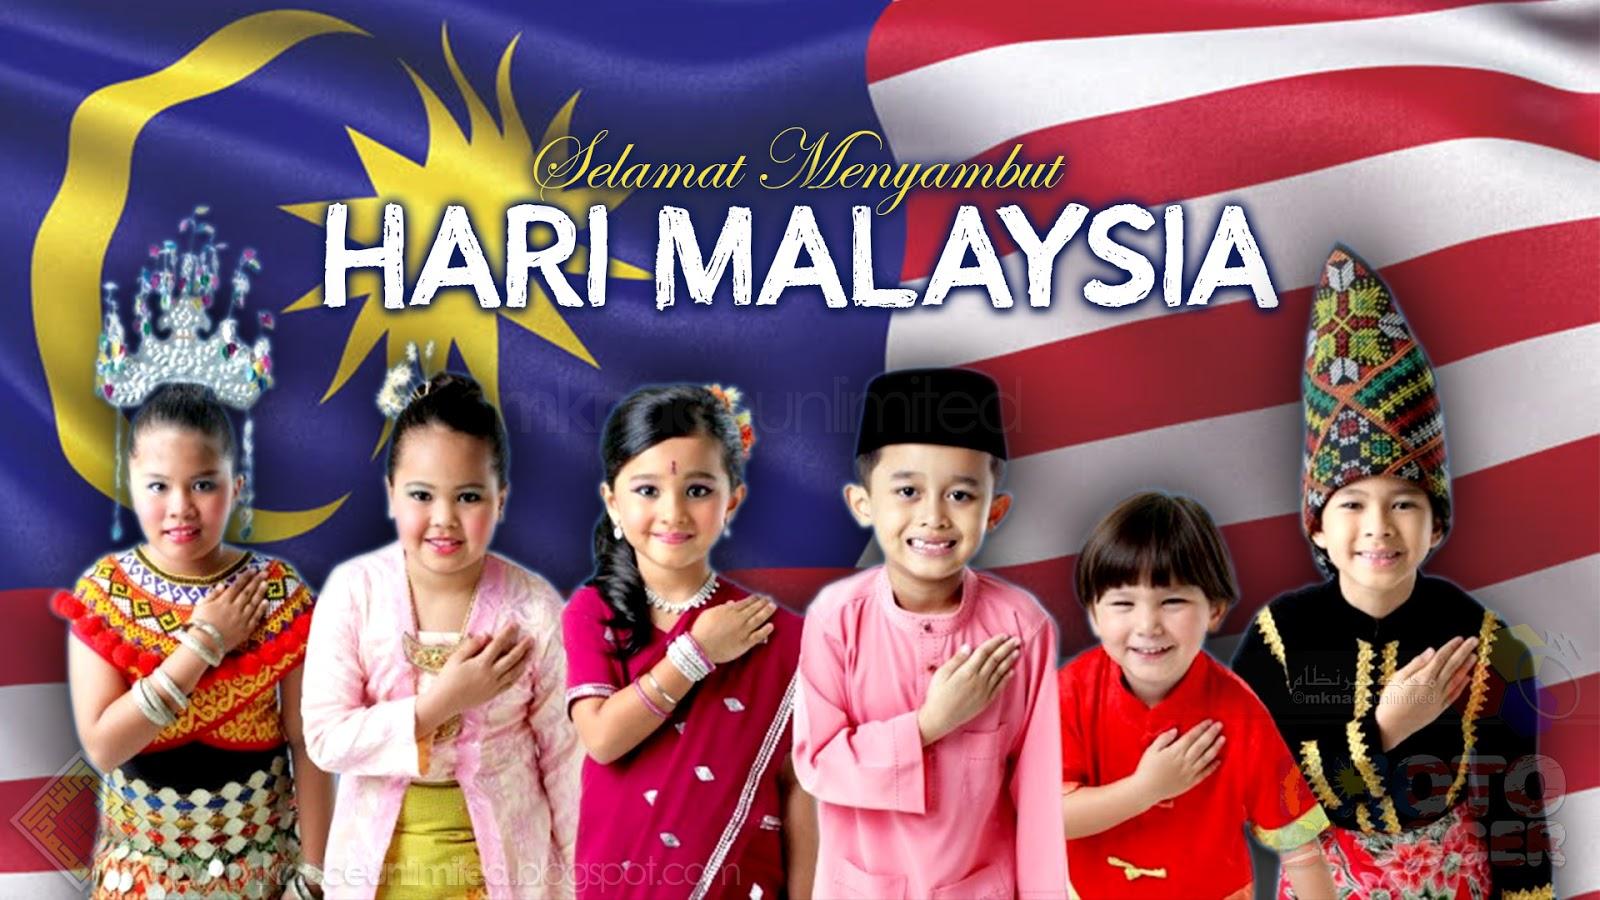 Selamat Menyambut Hari Malaysia 2018 Mknace Unlimited The Colours Tcash Vaganza 32 Milo Activ Go